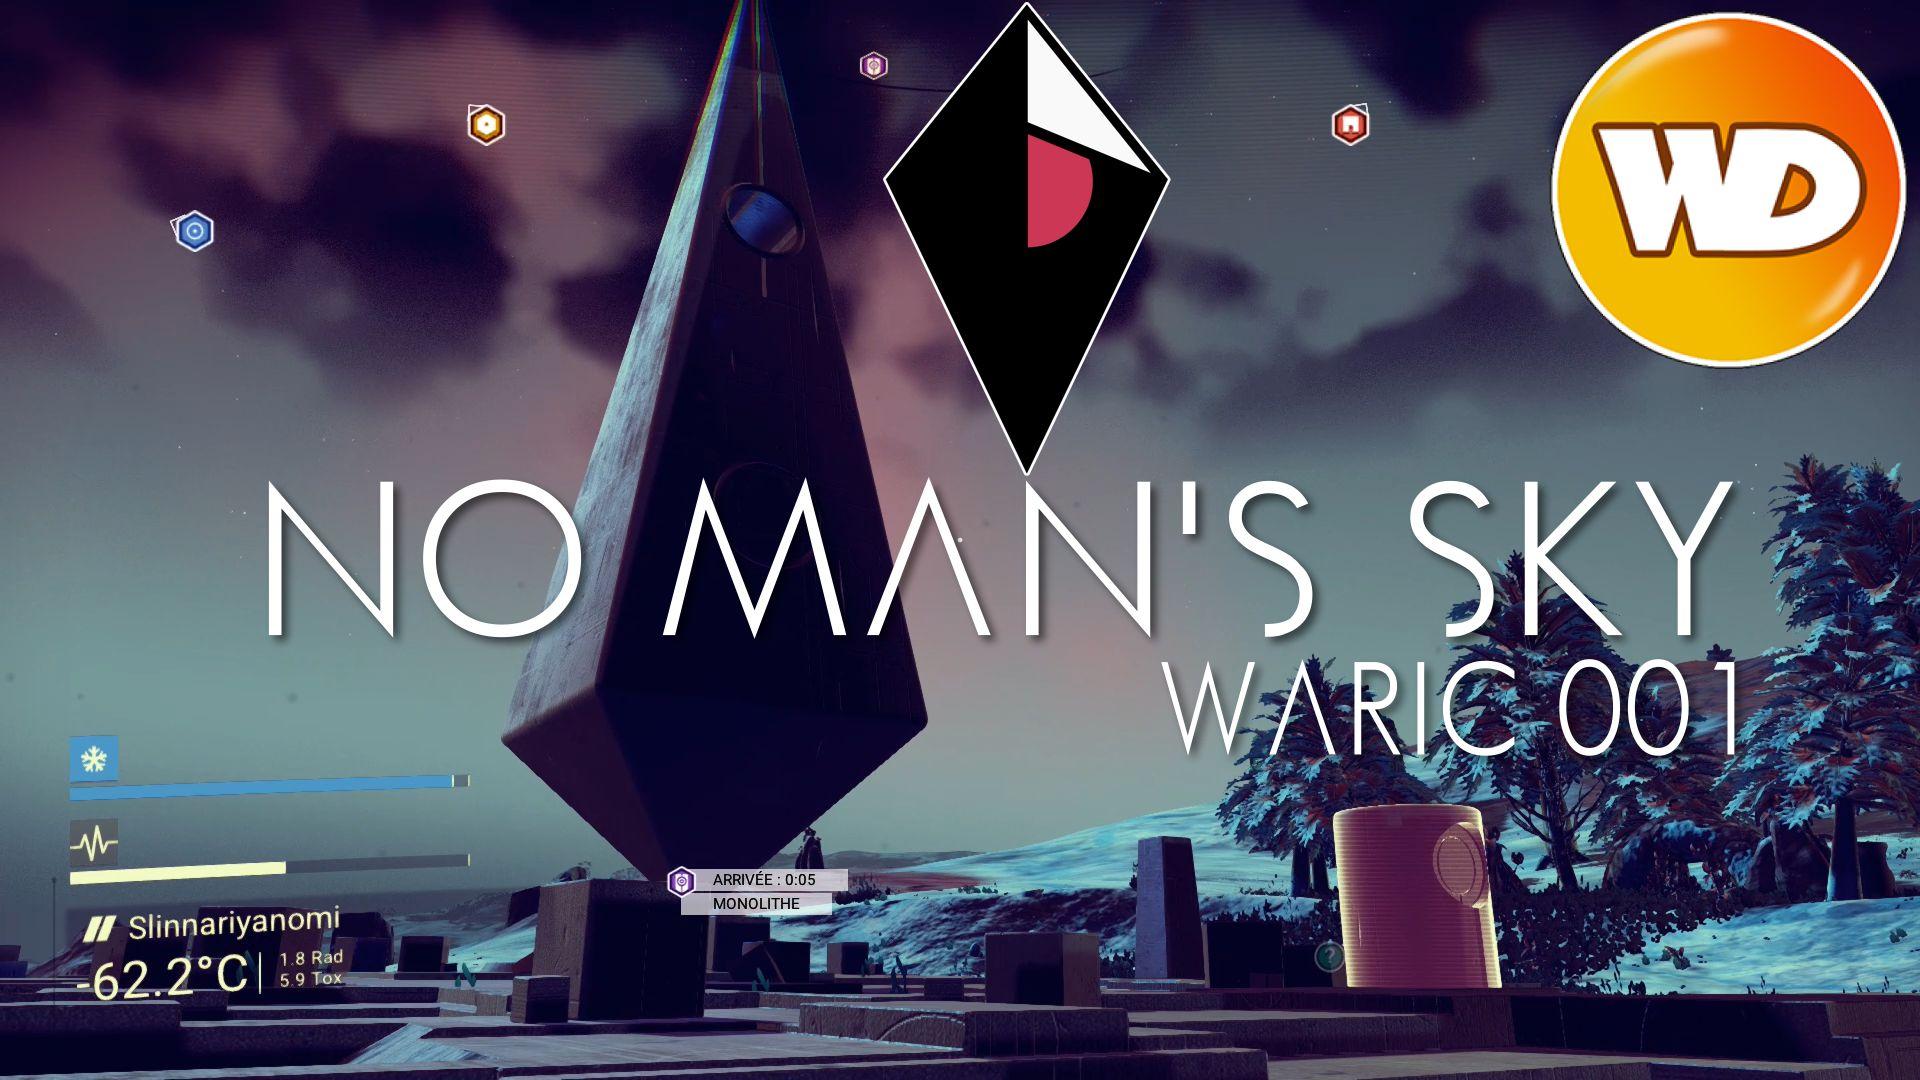 No man's Sky - FR - waric 001